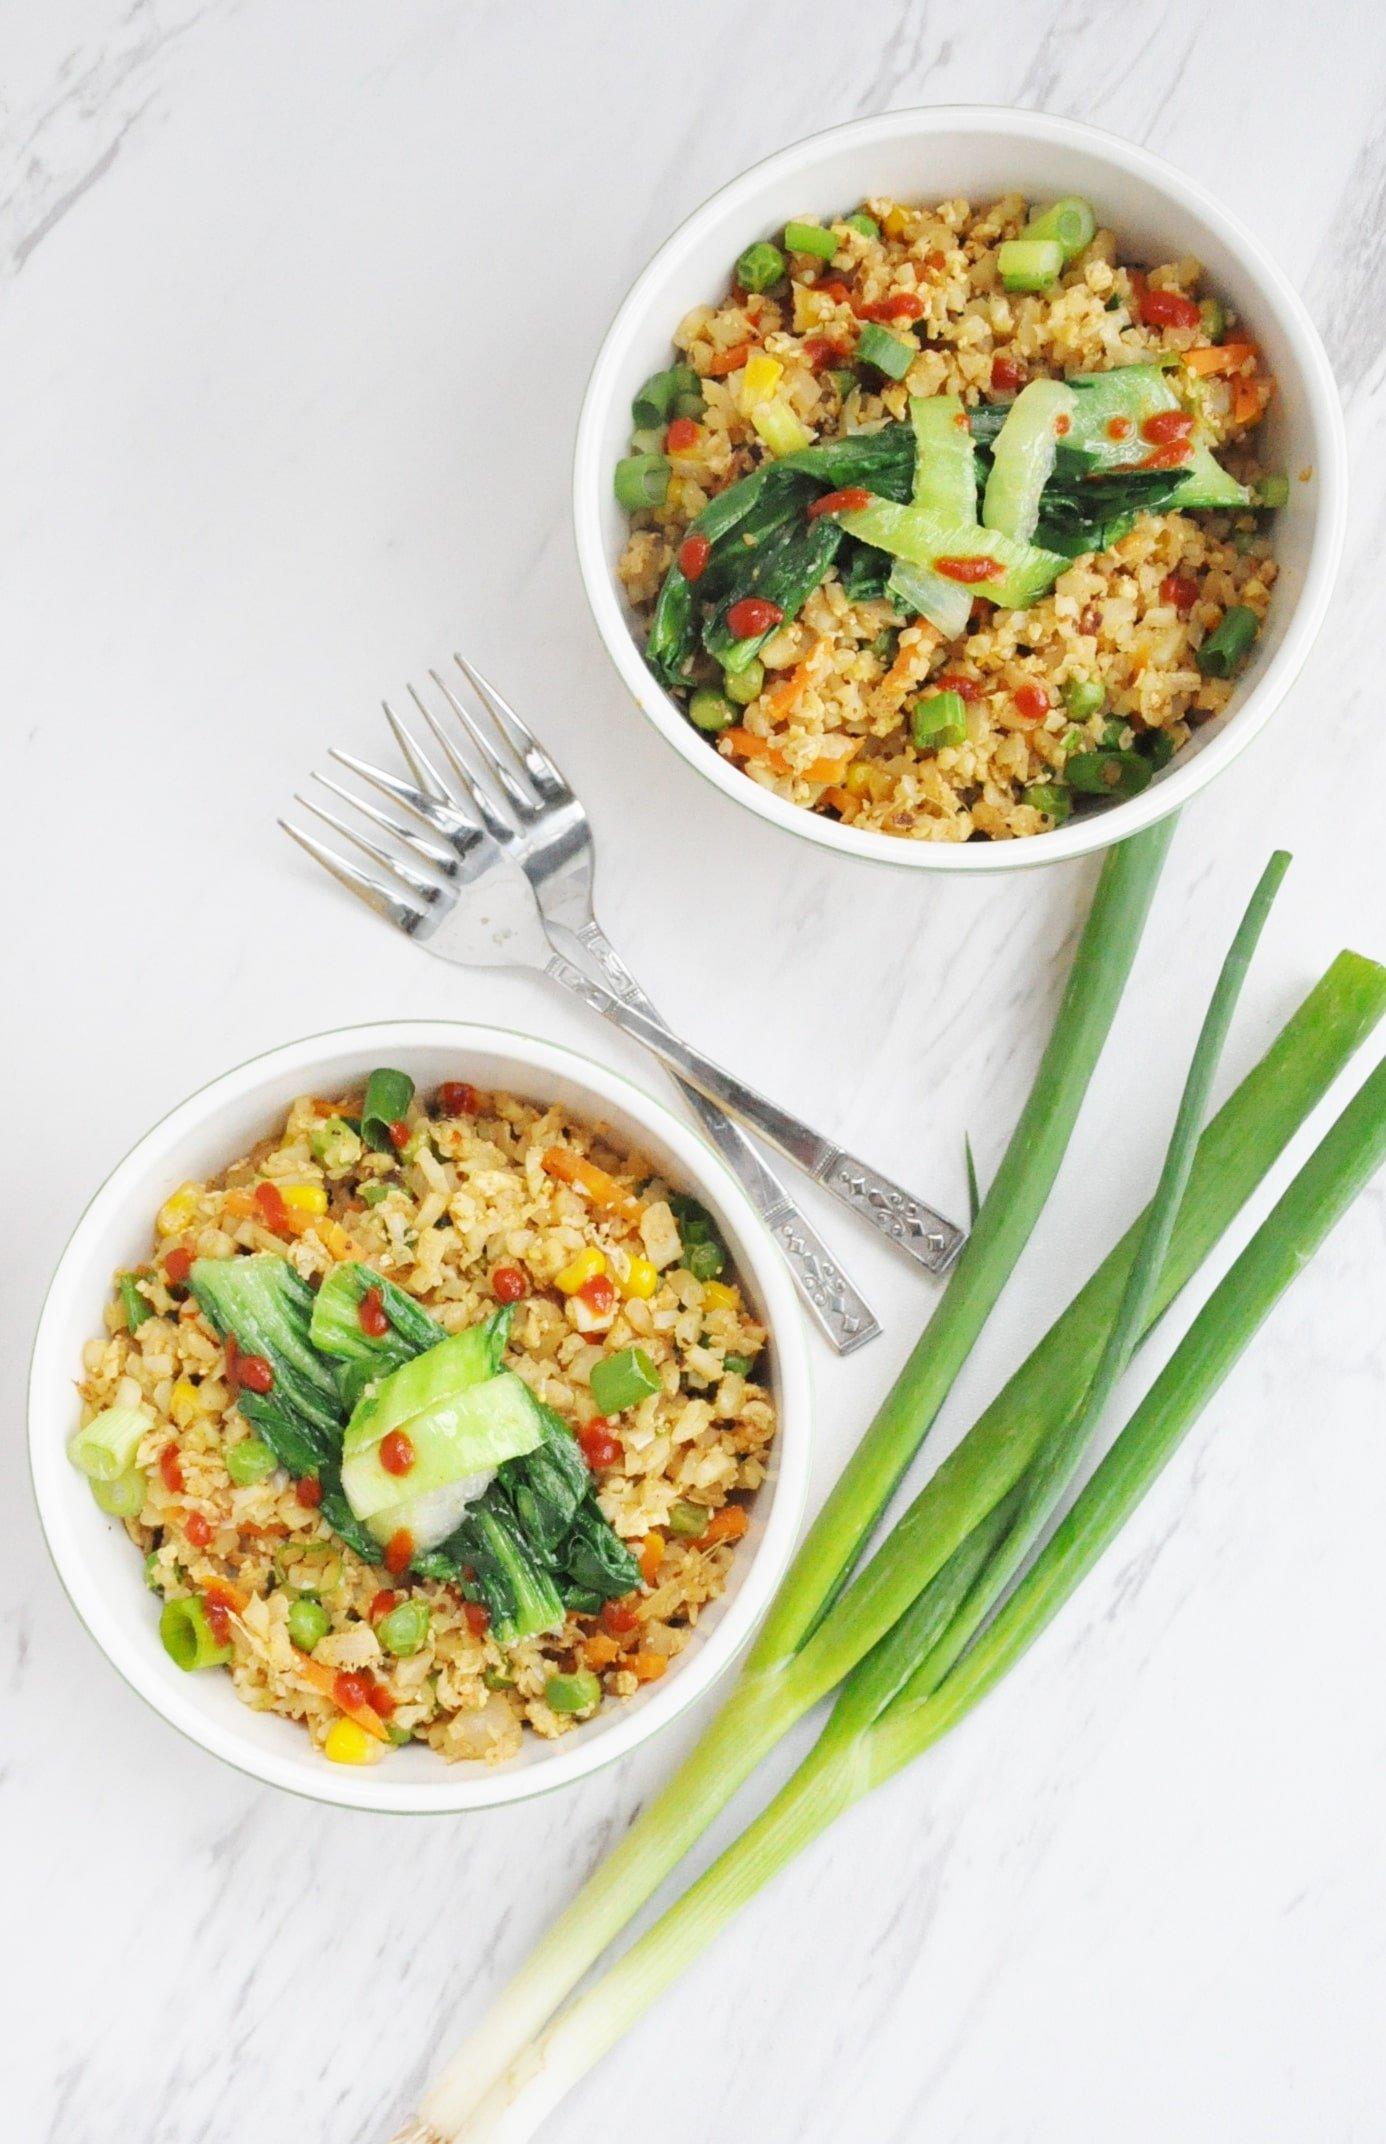 Orange Cauliflower Recipes Low Carb